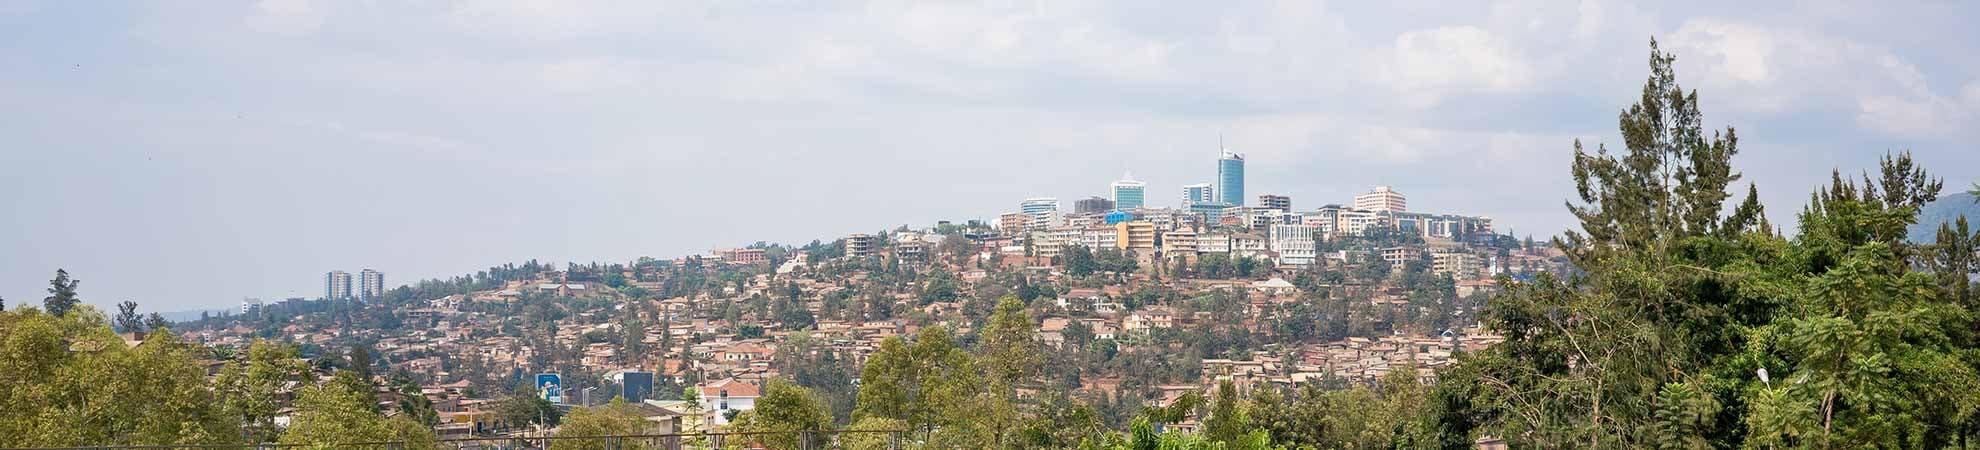 Fiche Pays Rwanda